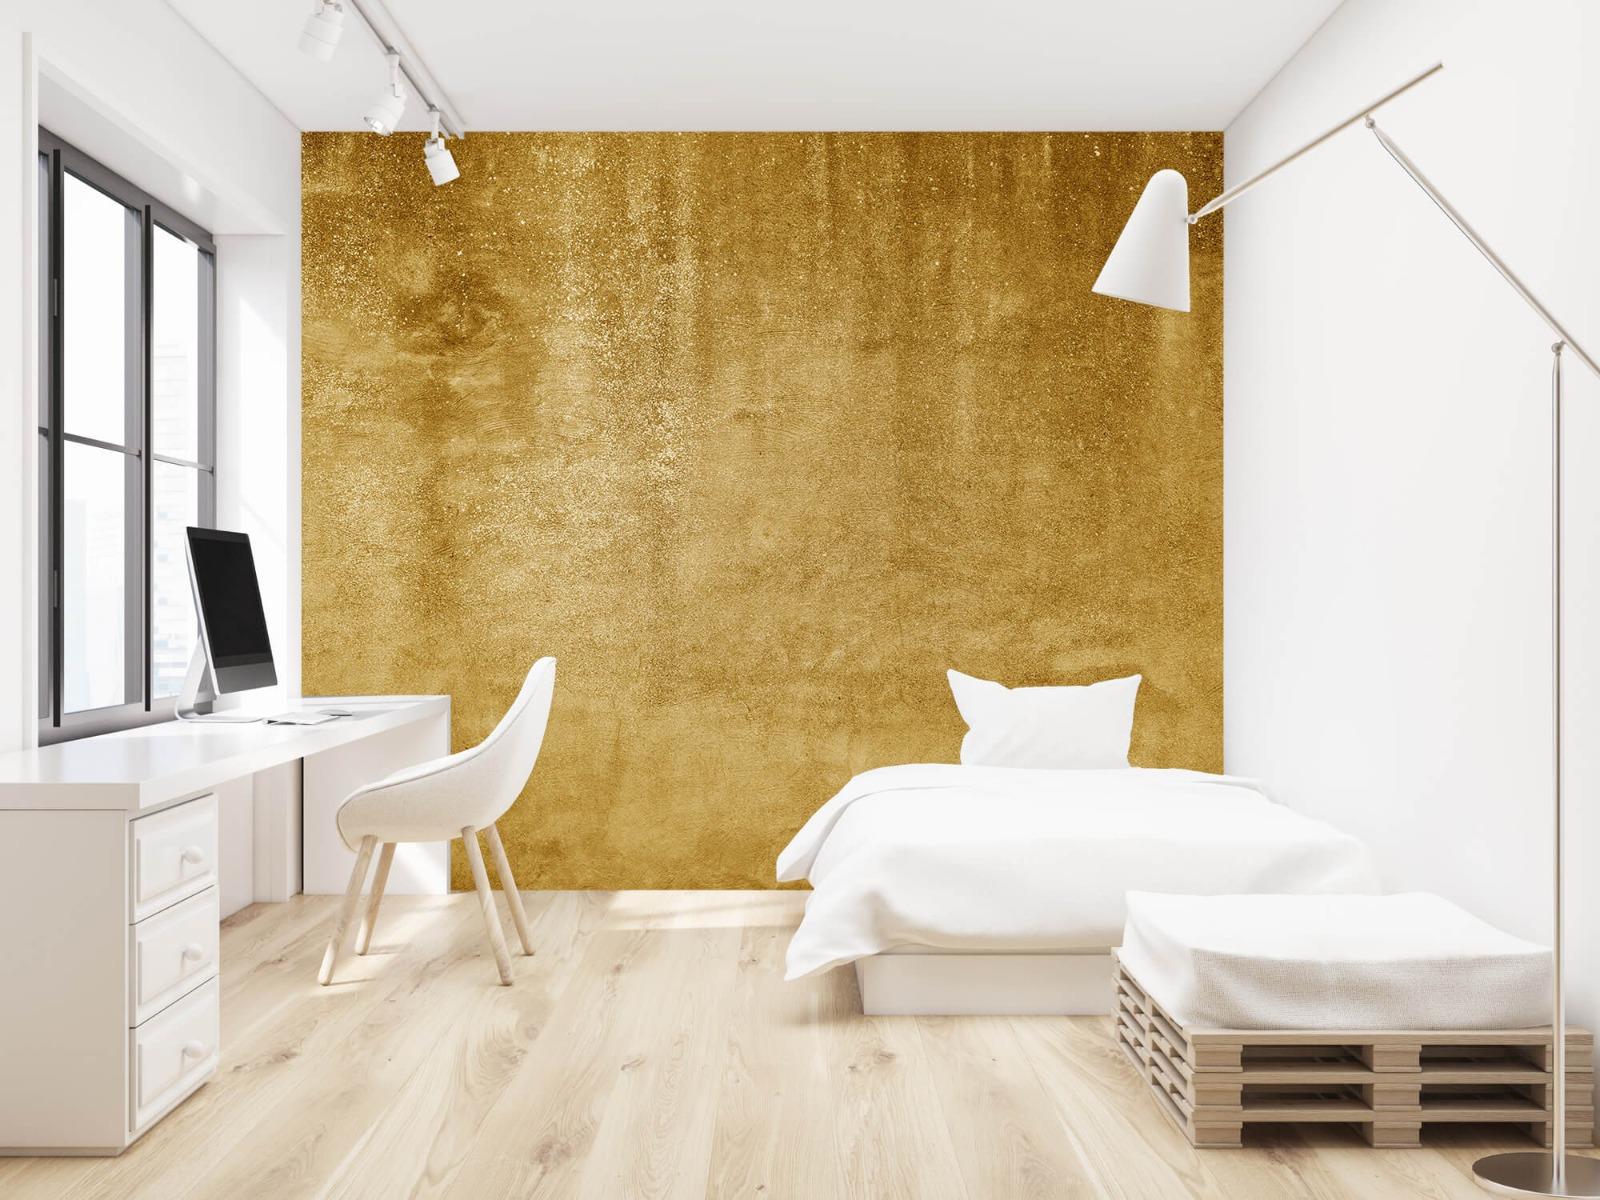 Betonlook behang - Oker geel beton - Woonkamer 22